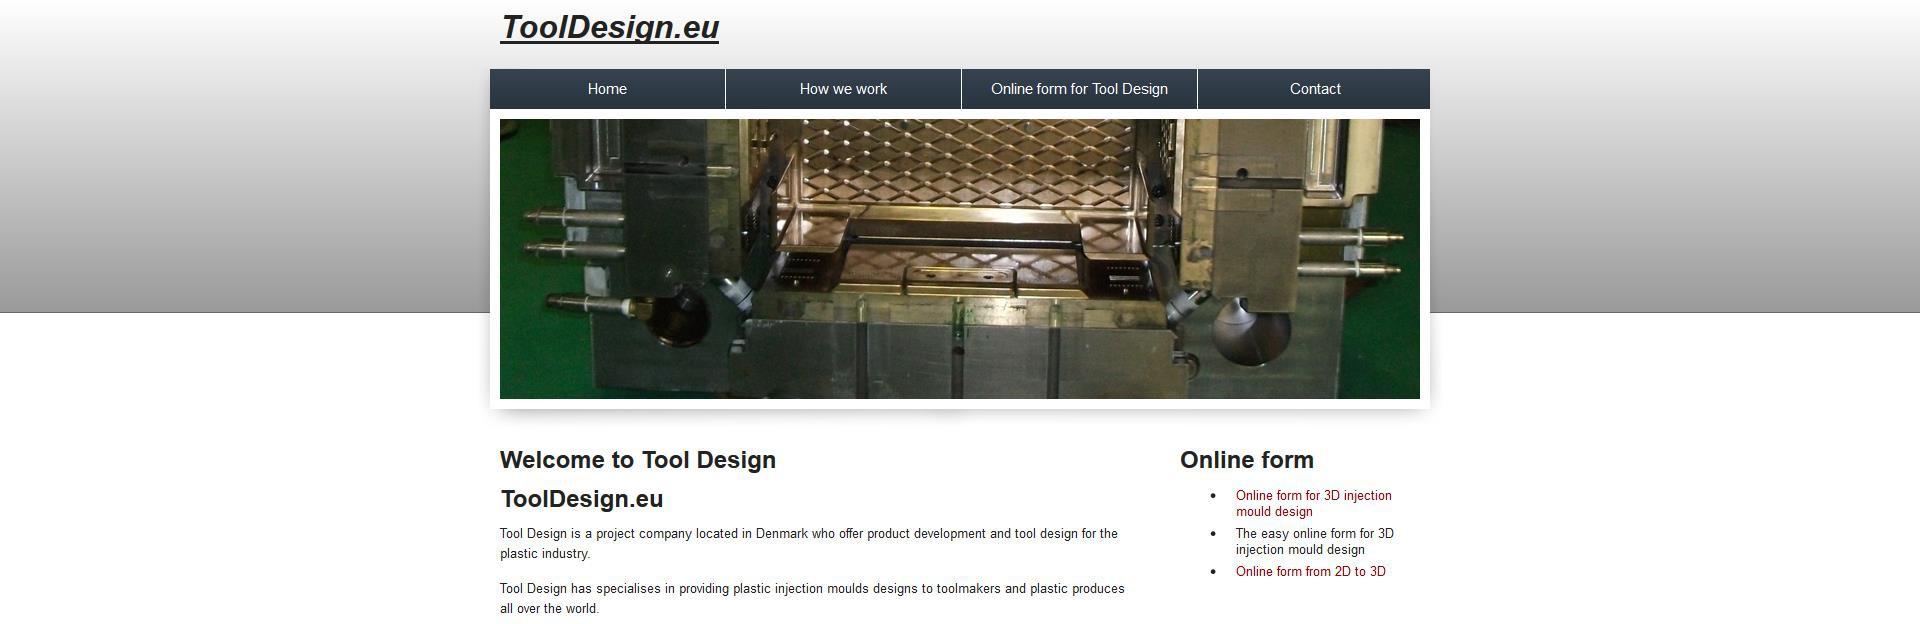 ToolDesign.eu